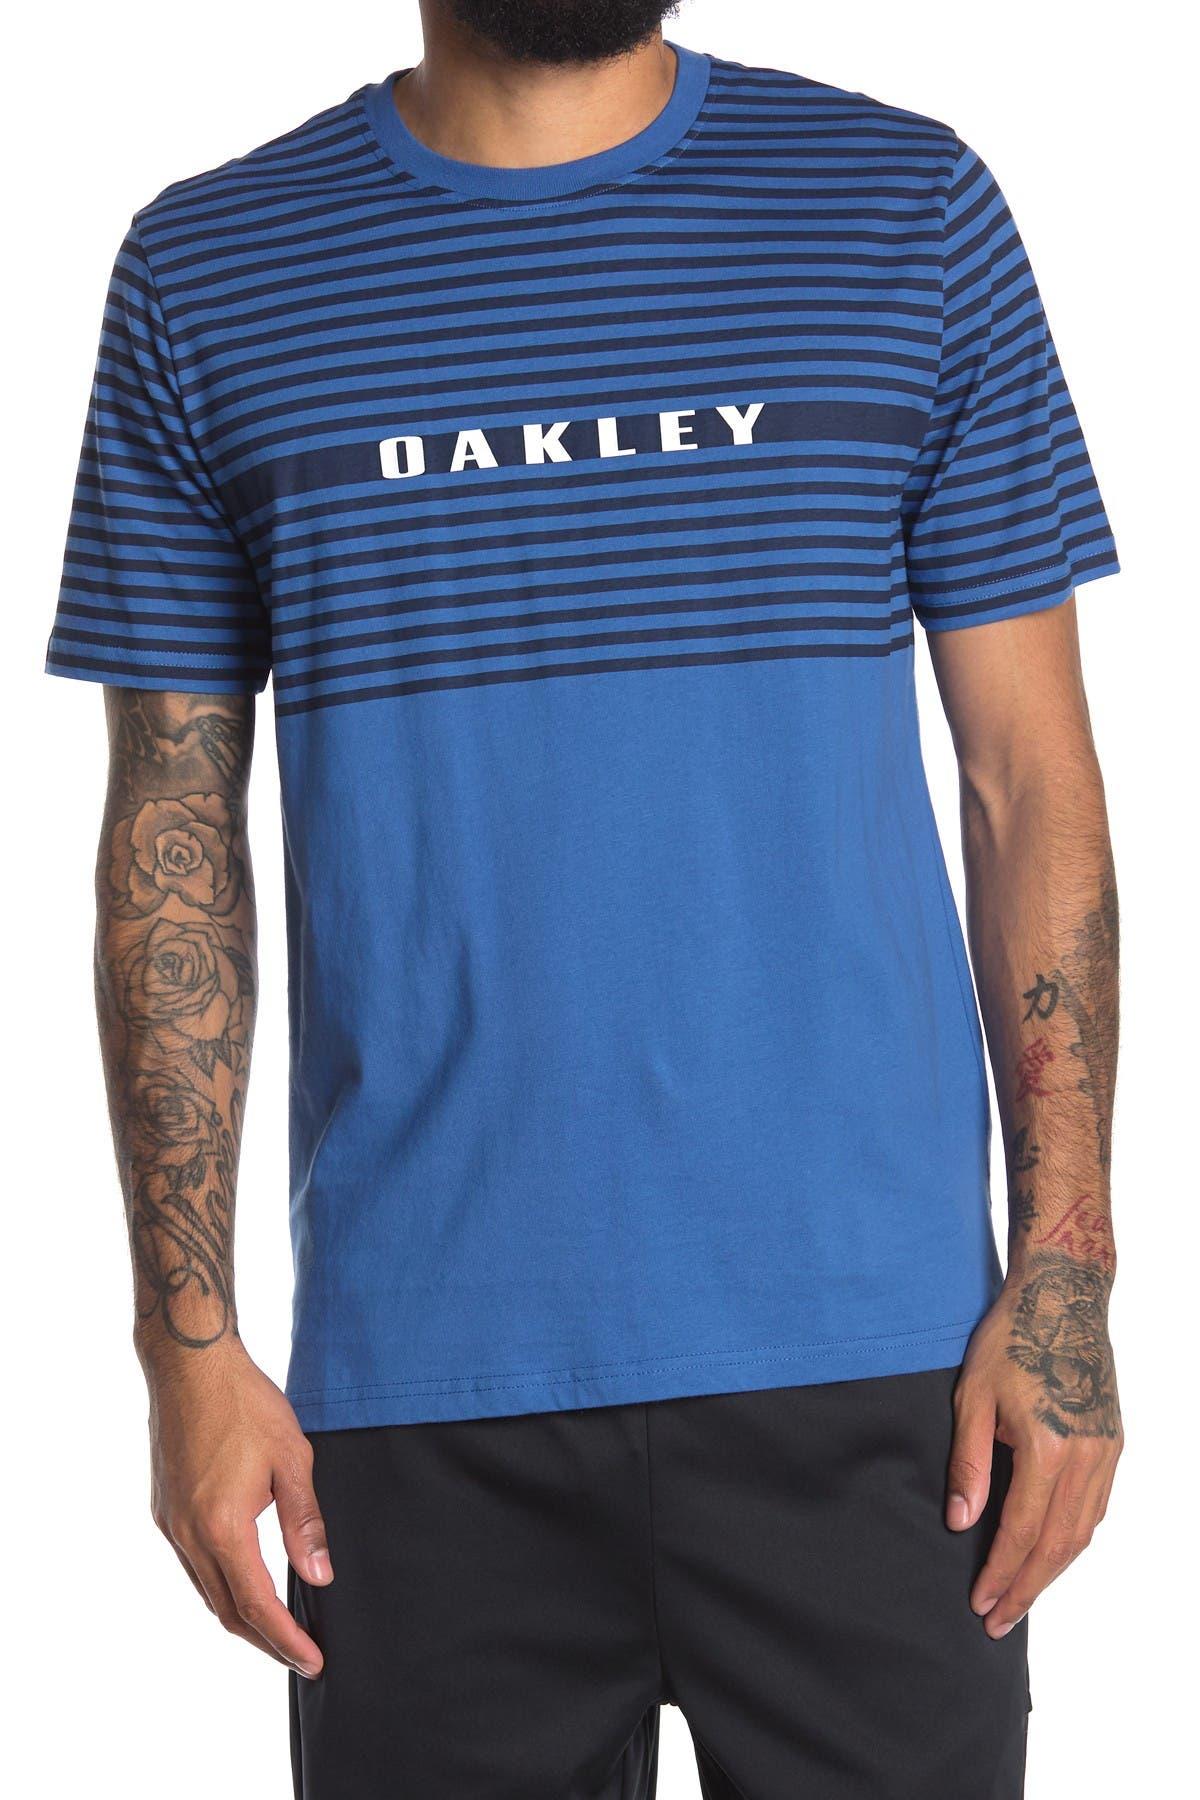 Image of Oakley Logo Colorblocked Stripe T-Shirt